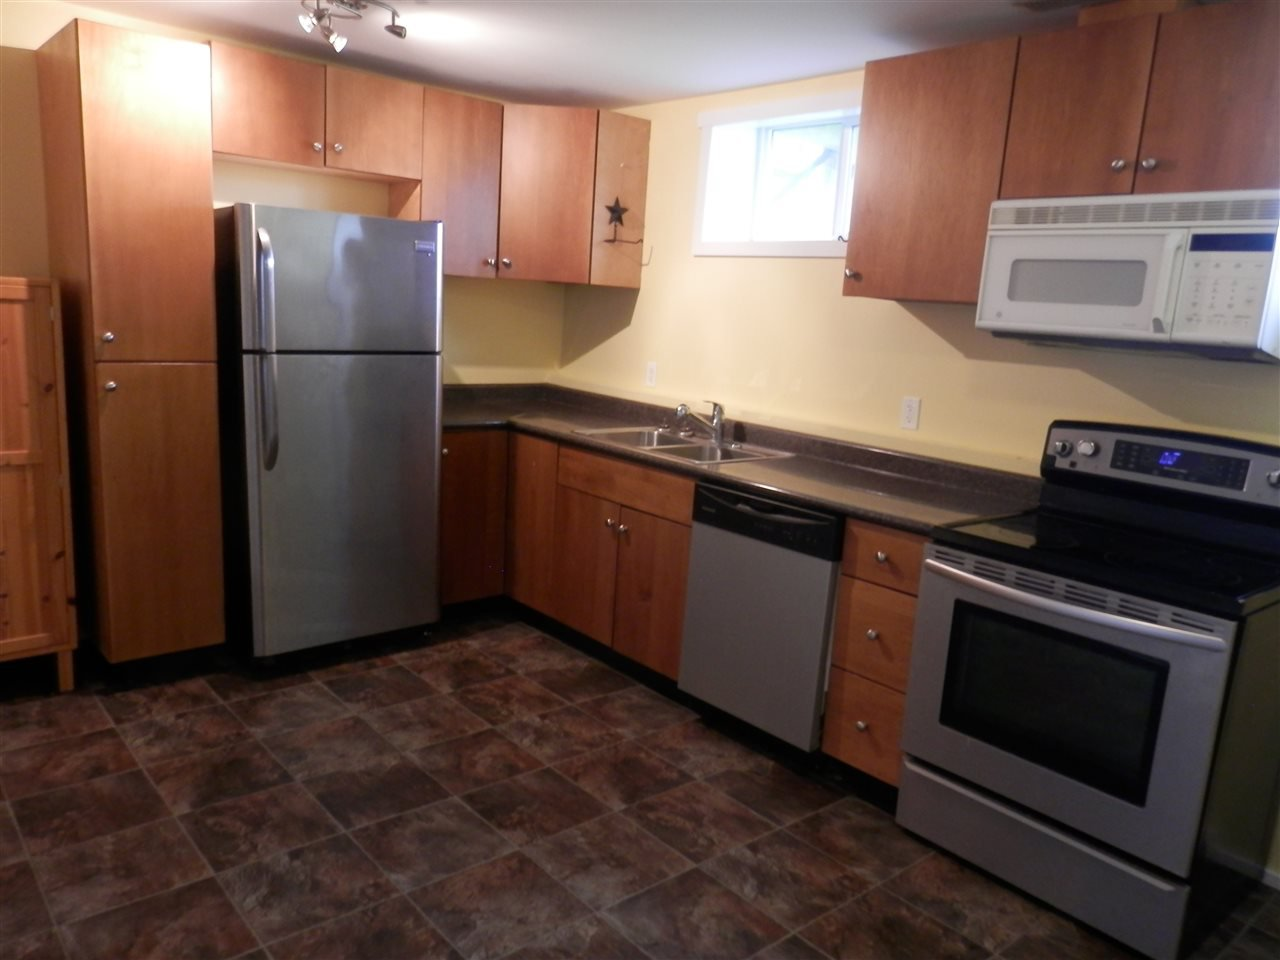 Photo 10: Photos: 779 PIGEON Avenue in Williams Lake: Williams Lake - City House for sale (Williams Lake (Zone 27))  : MLS®# R2499311